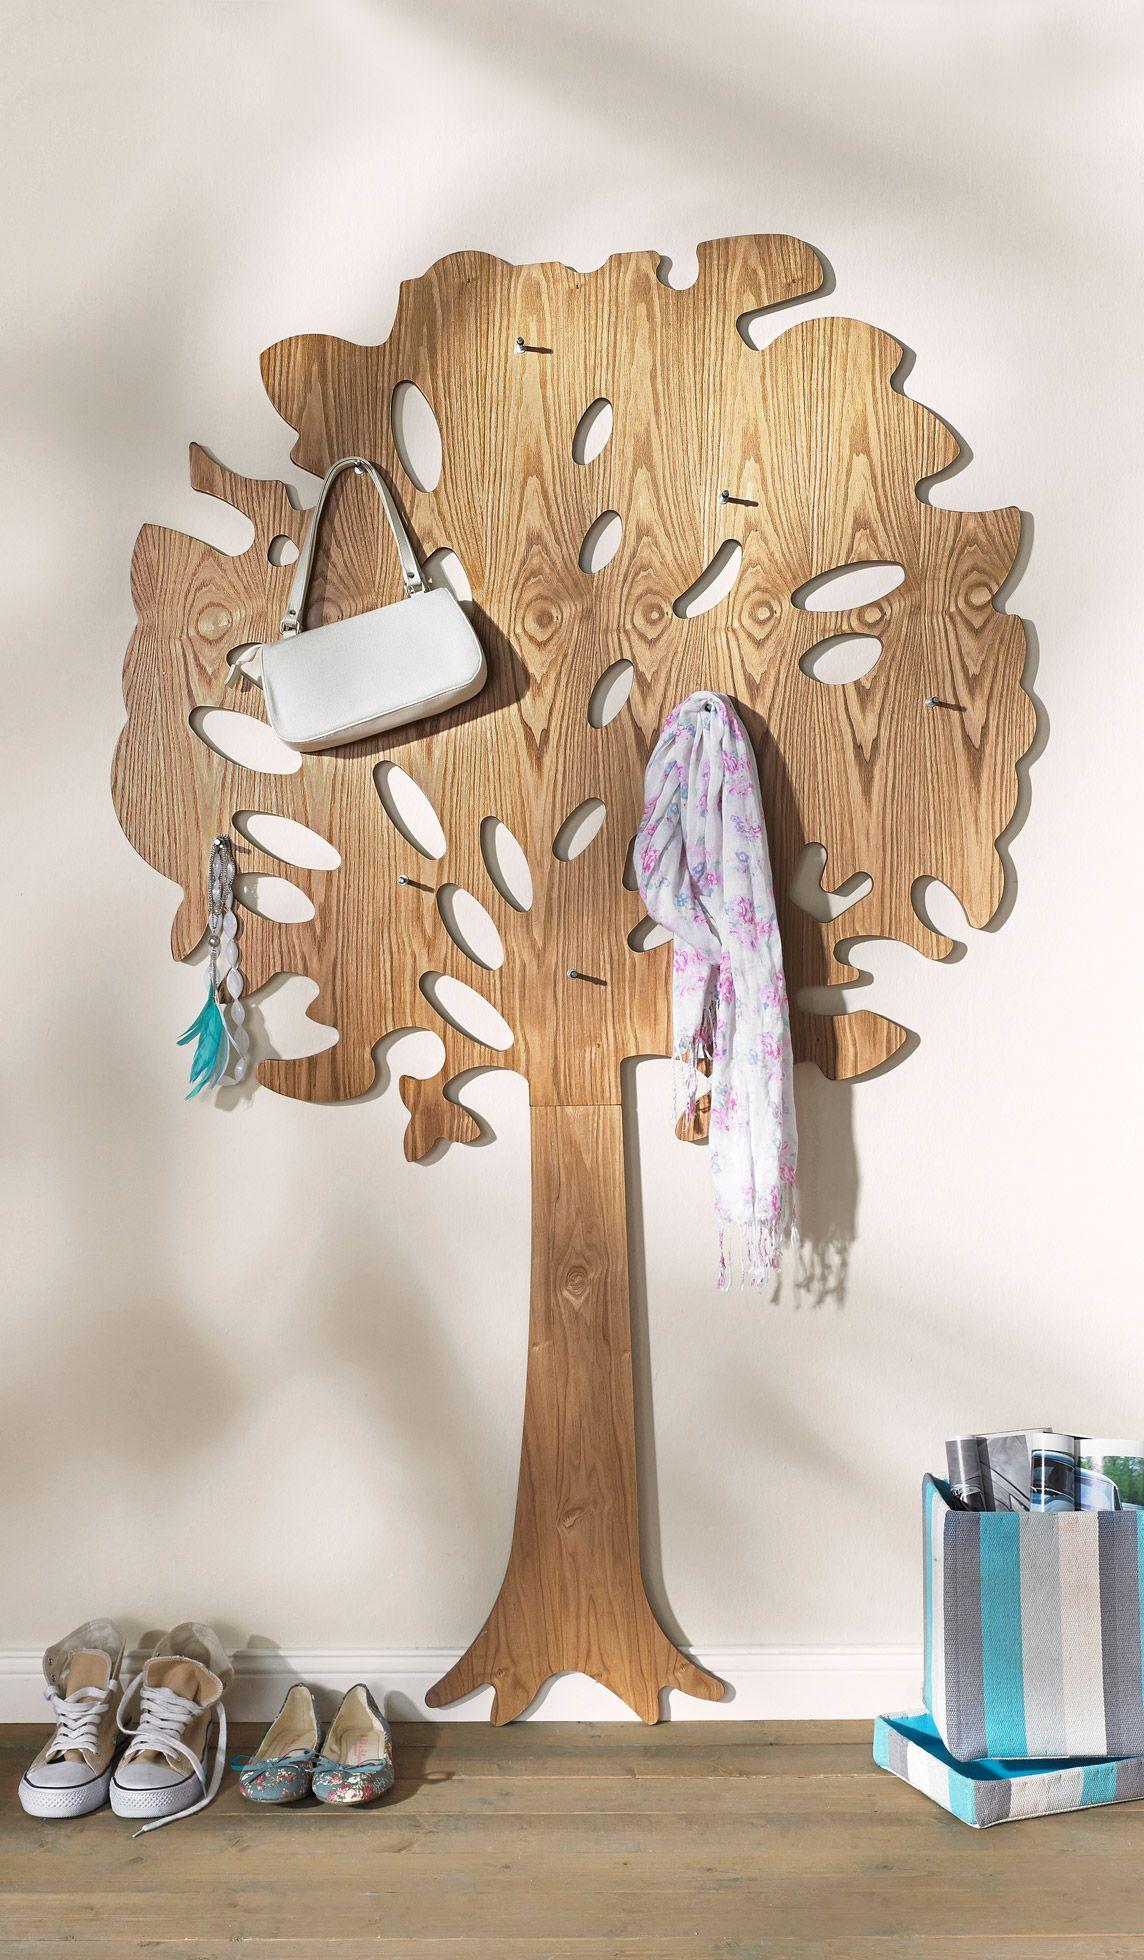 Garderobe Im Baum Design In 2020 Garderobe Baum Garderobenbaum